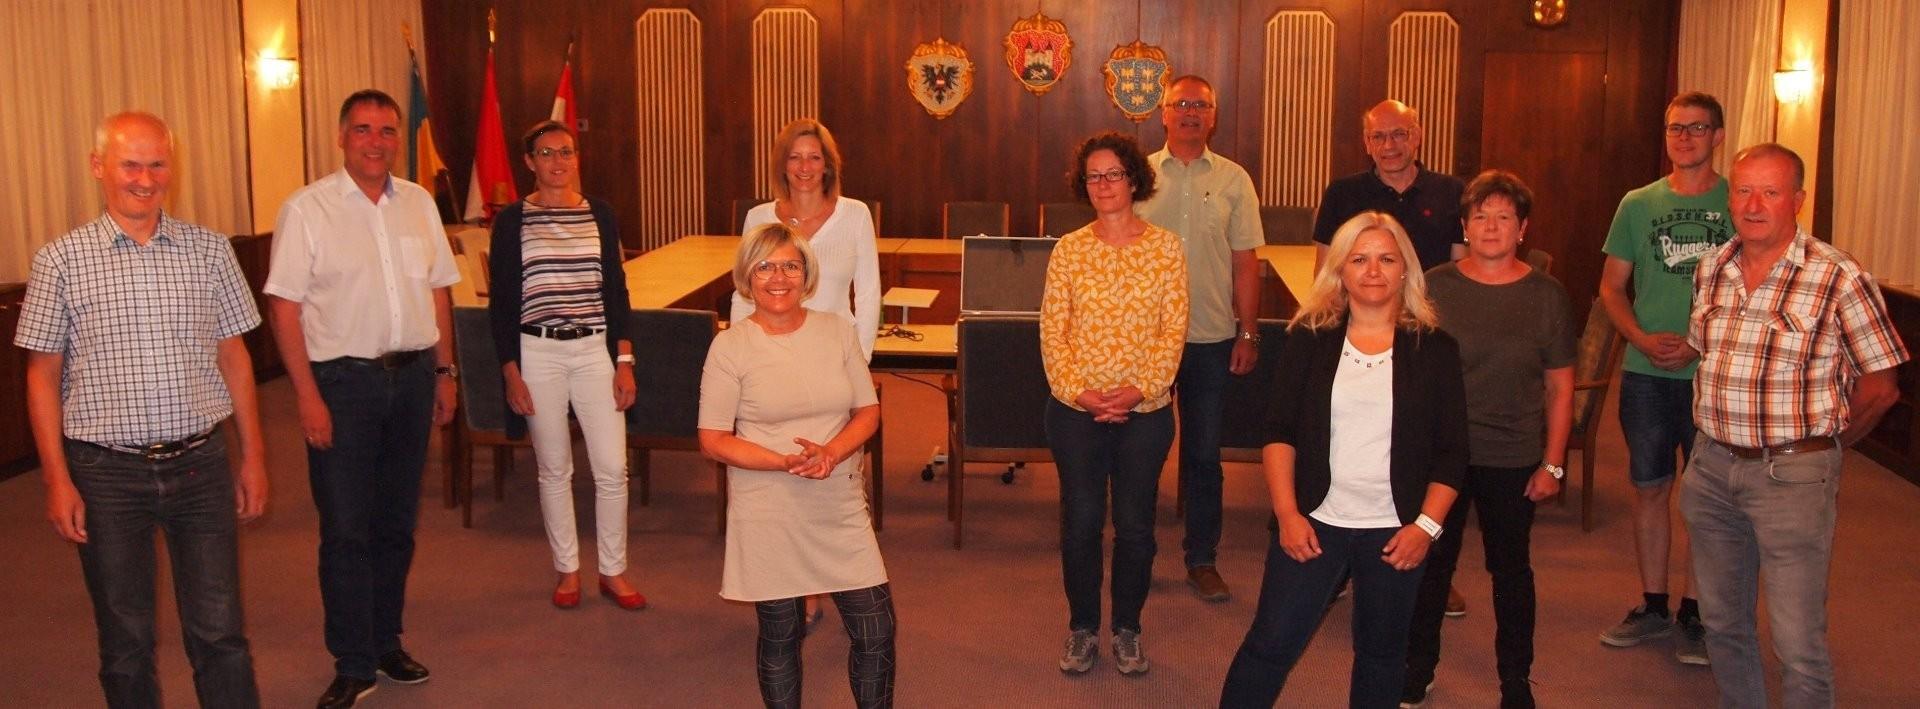 Abschluss-Sitzung Gruppenfoto 07-2020_1.jpg